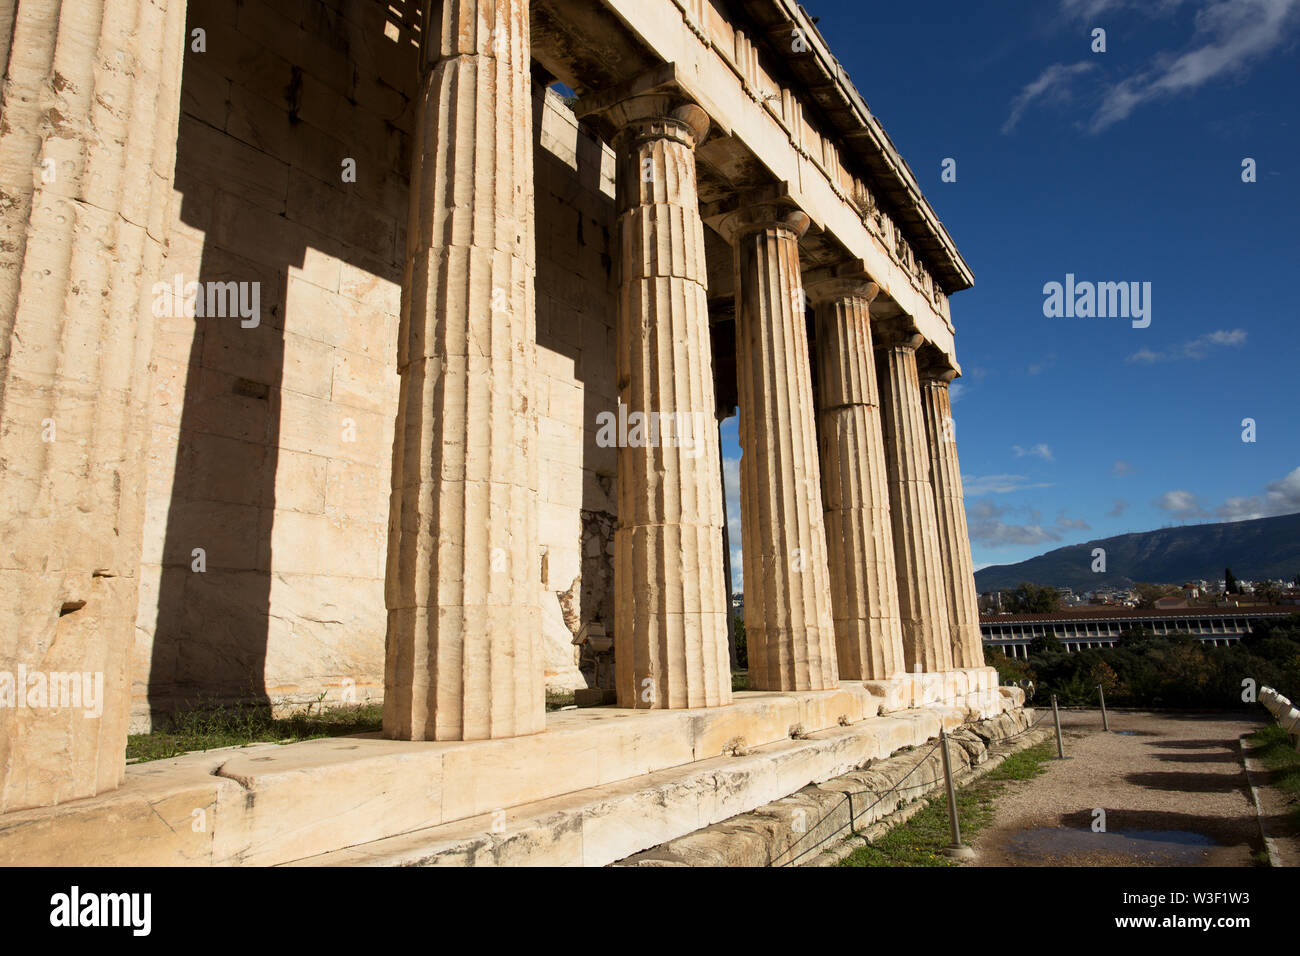 Keywords: hephaestus, temple, greece, athens, ancient, agora, acropolis, greek, historic, old, travel, architecture, city, tourism, culture, europe, h - Stock Image